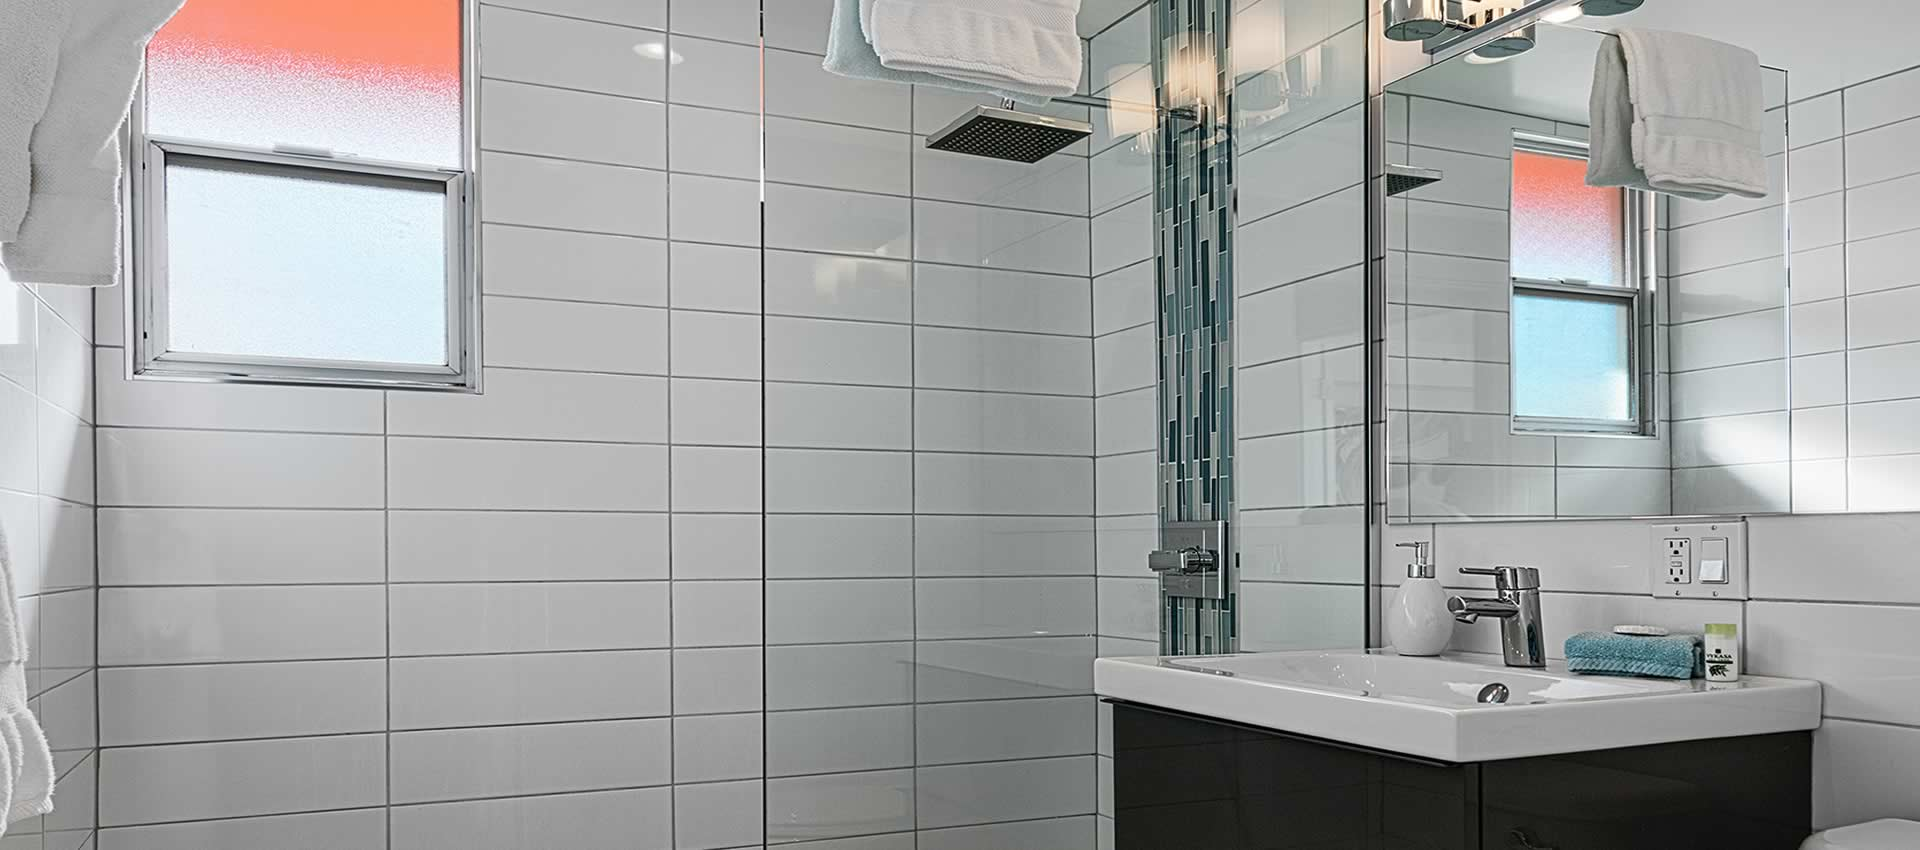 twist-hotel-room-220-bath